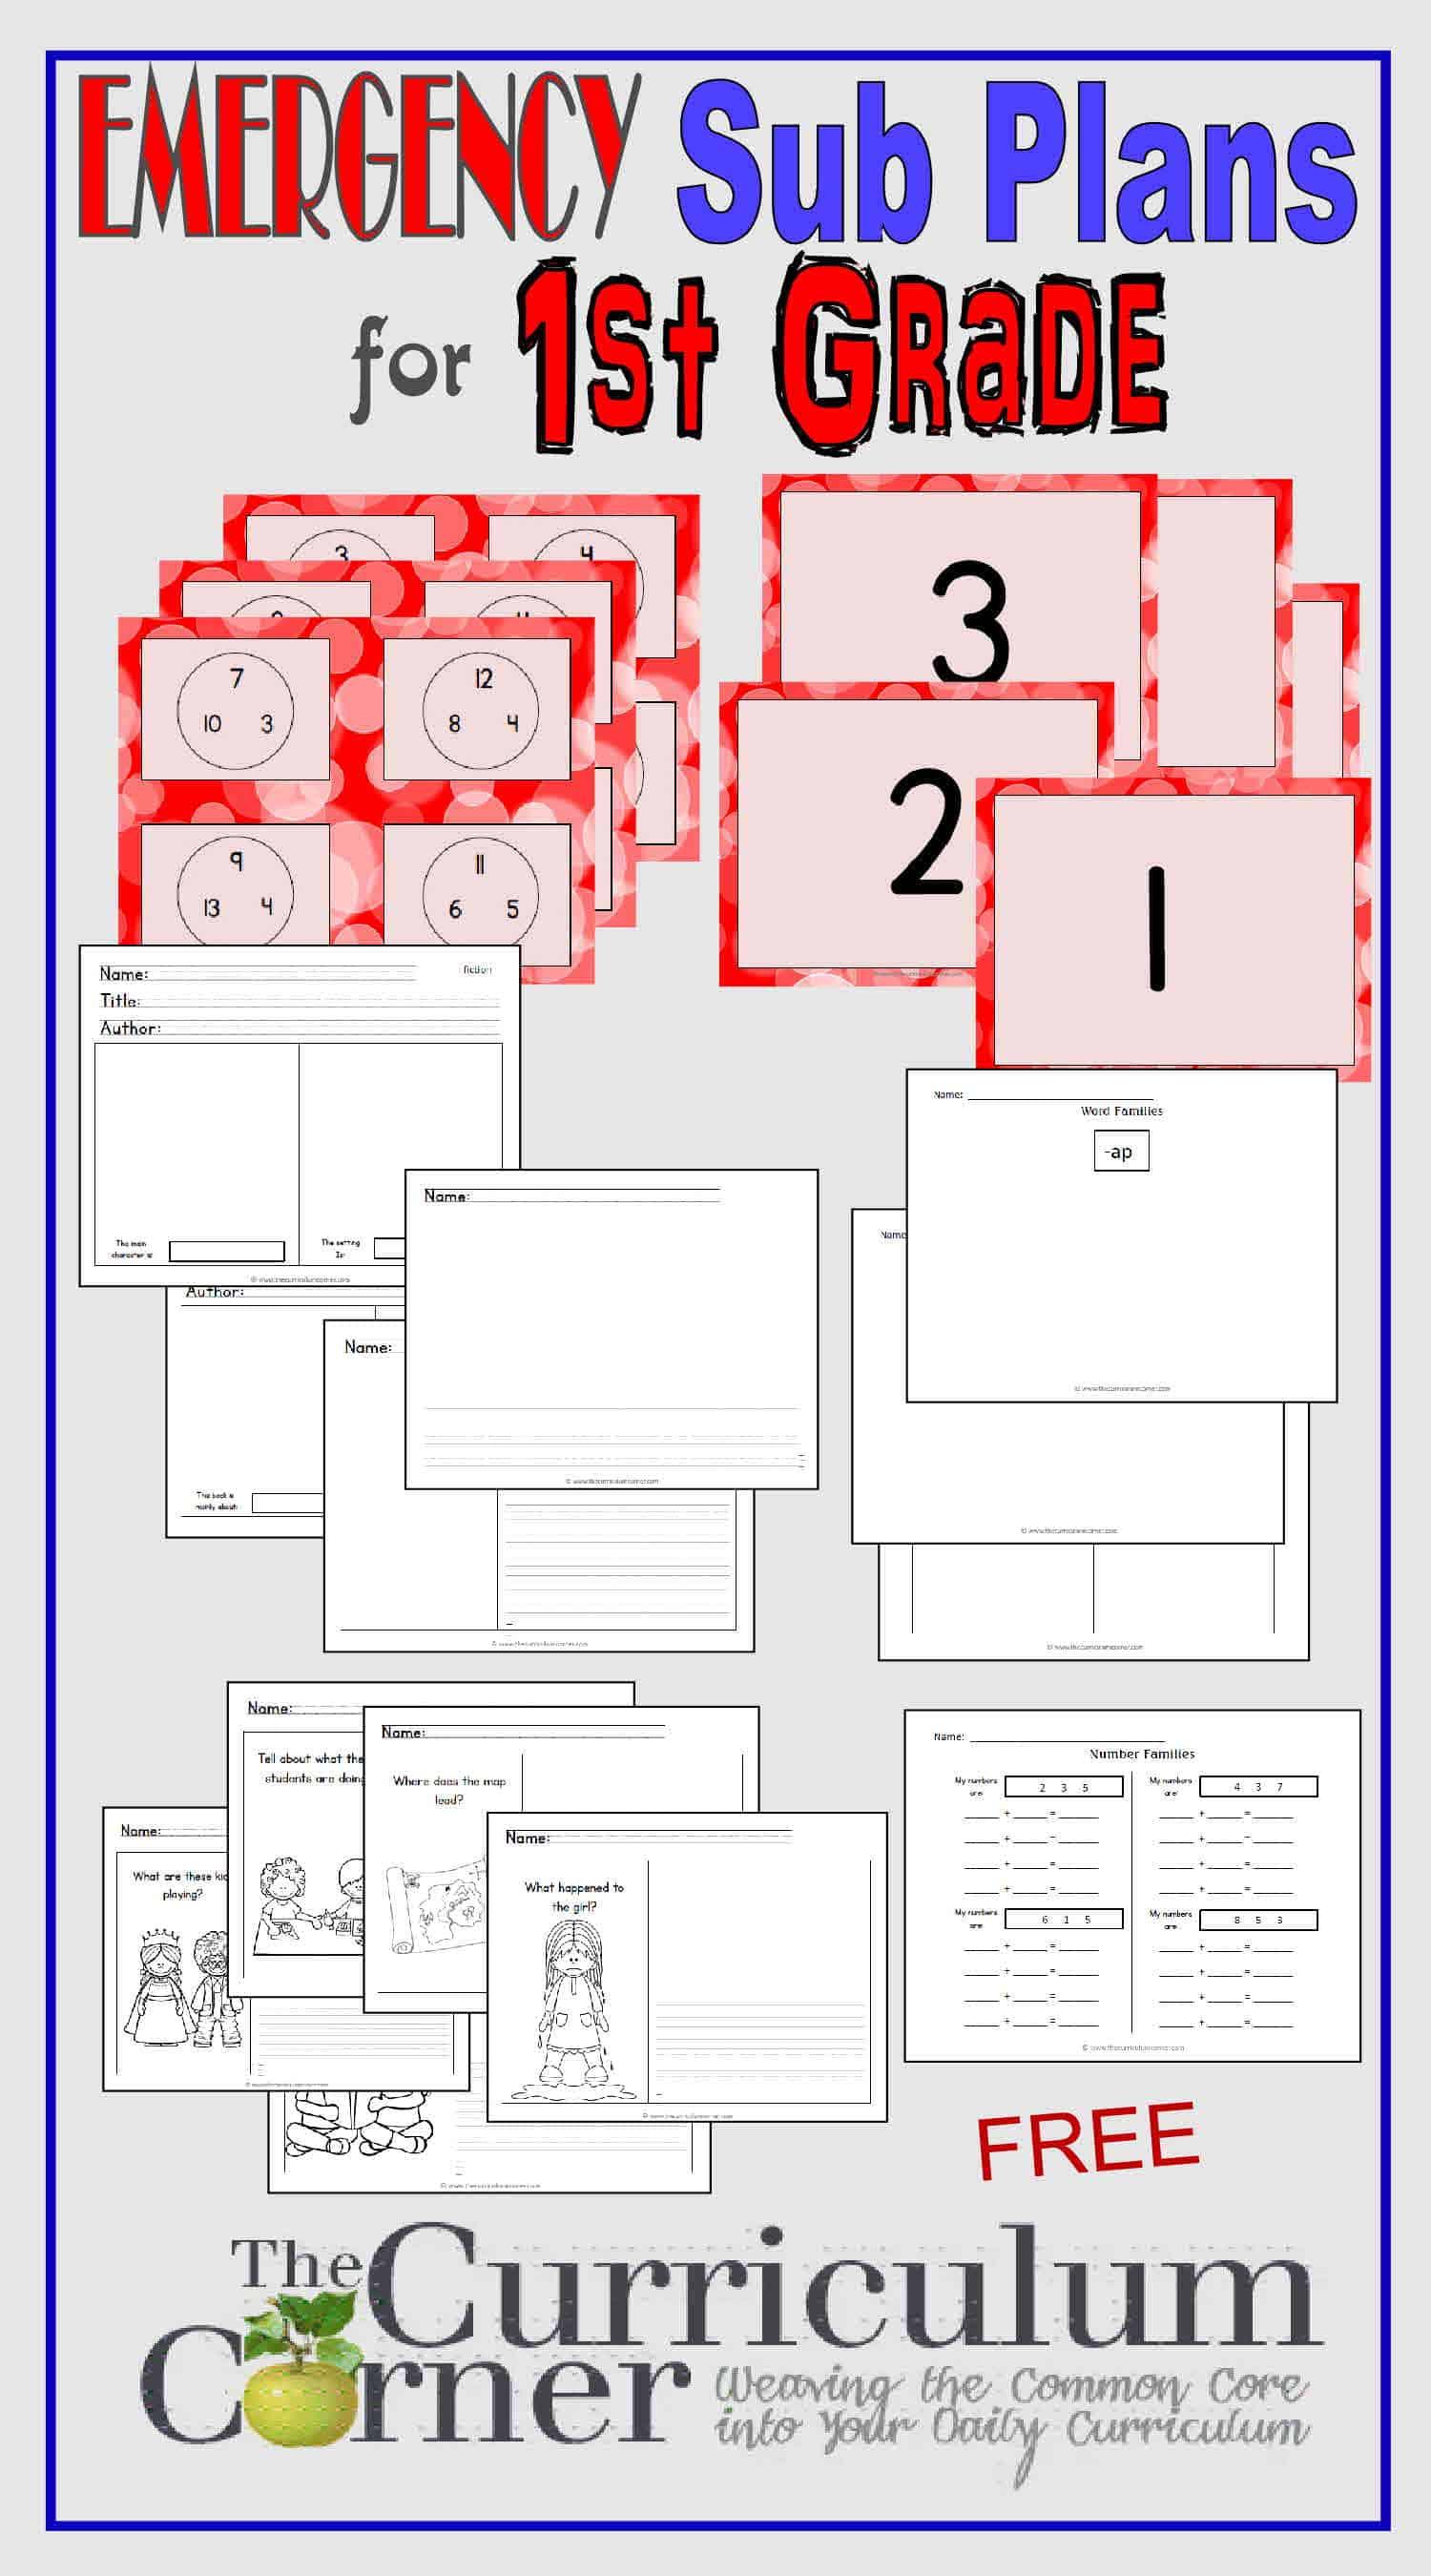 1st Grade Emergency Sub Plans